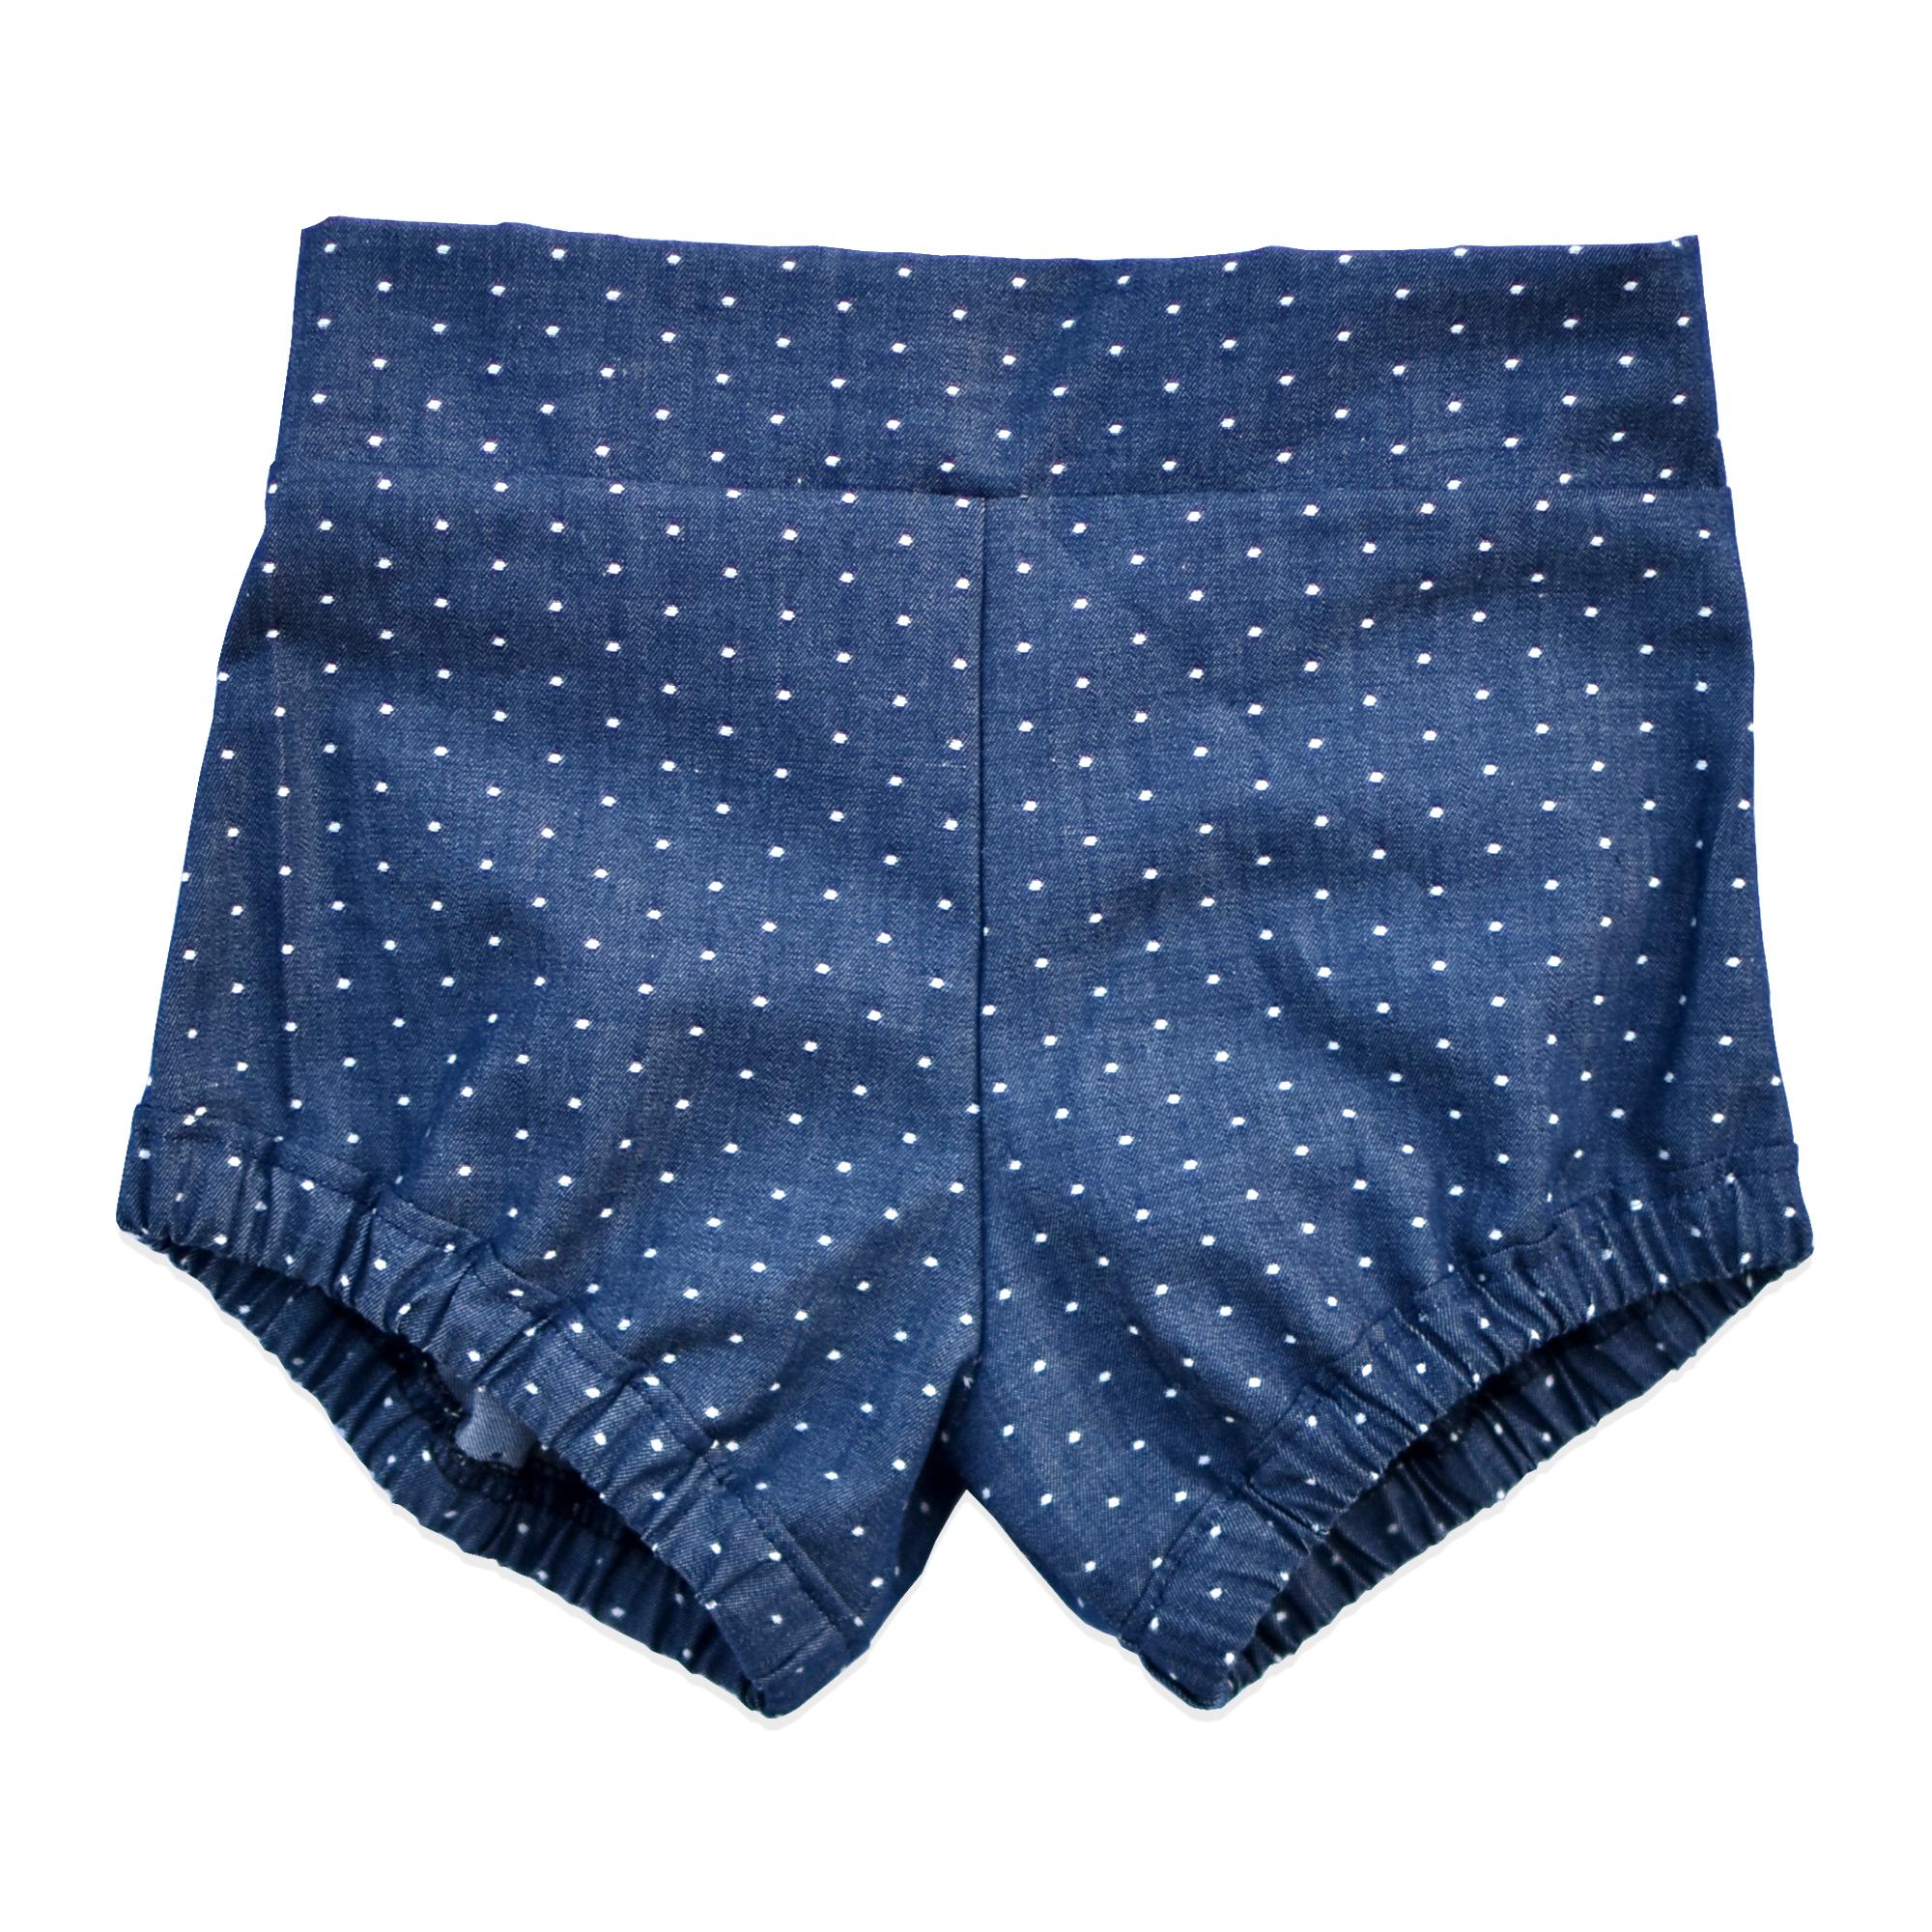 shorties-navy-white-dots-front-briabay